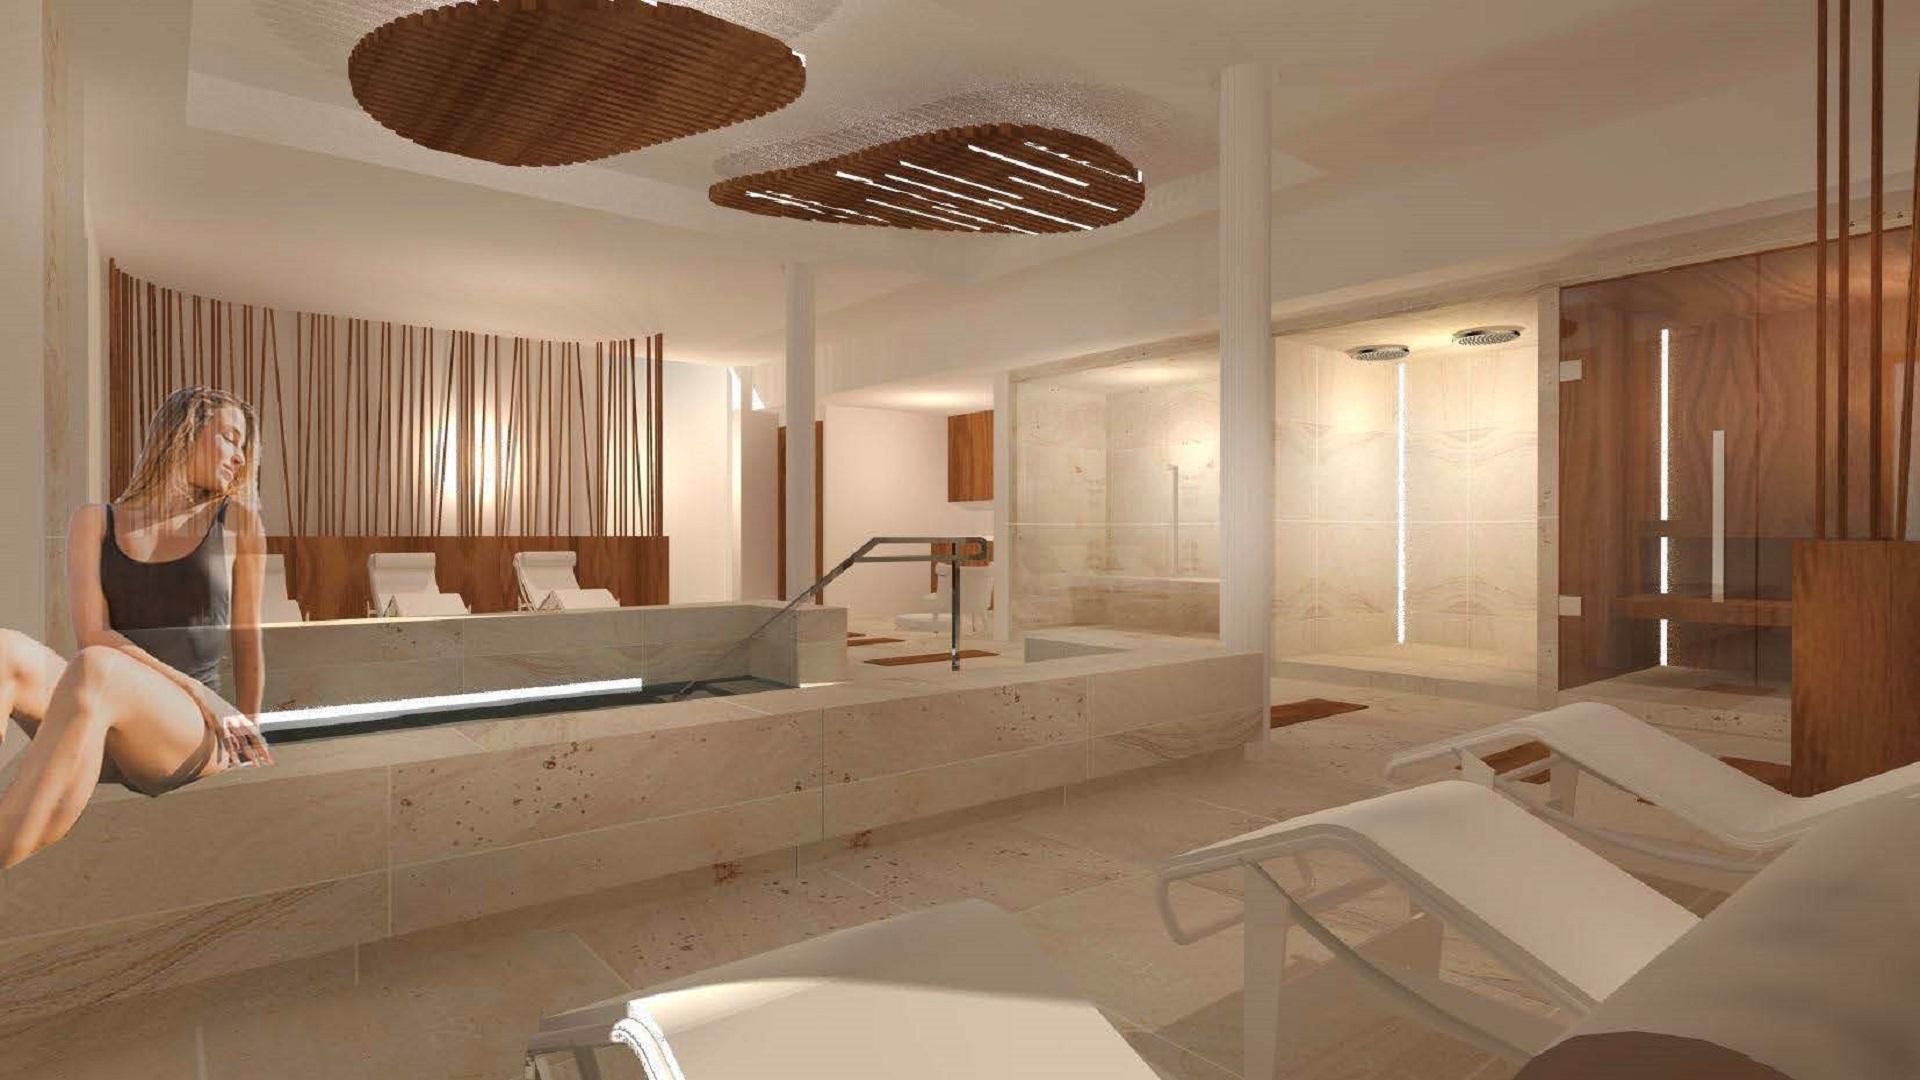 eden-rose-grand-hotel-bormes-les-mimosas-paca-cote-azur-ambiance-spa-seminaire